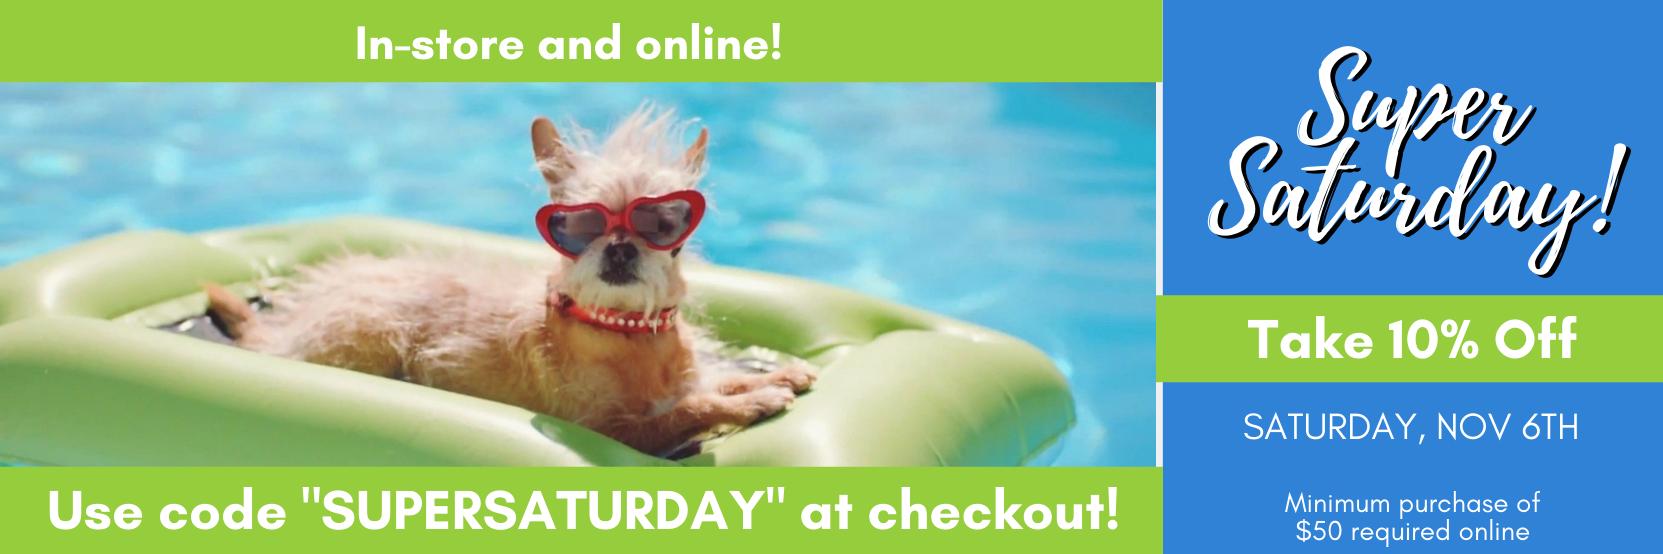 Super Saturday sale 10 percent off all online orders